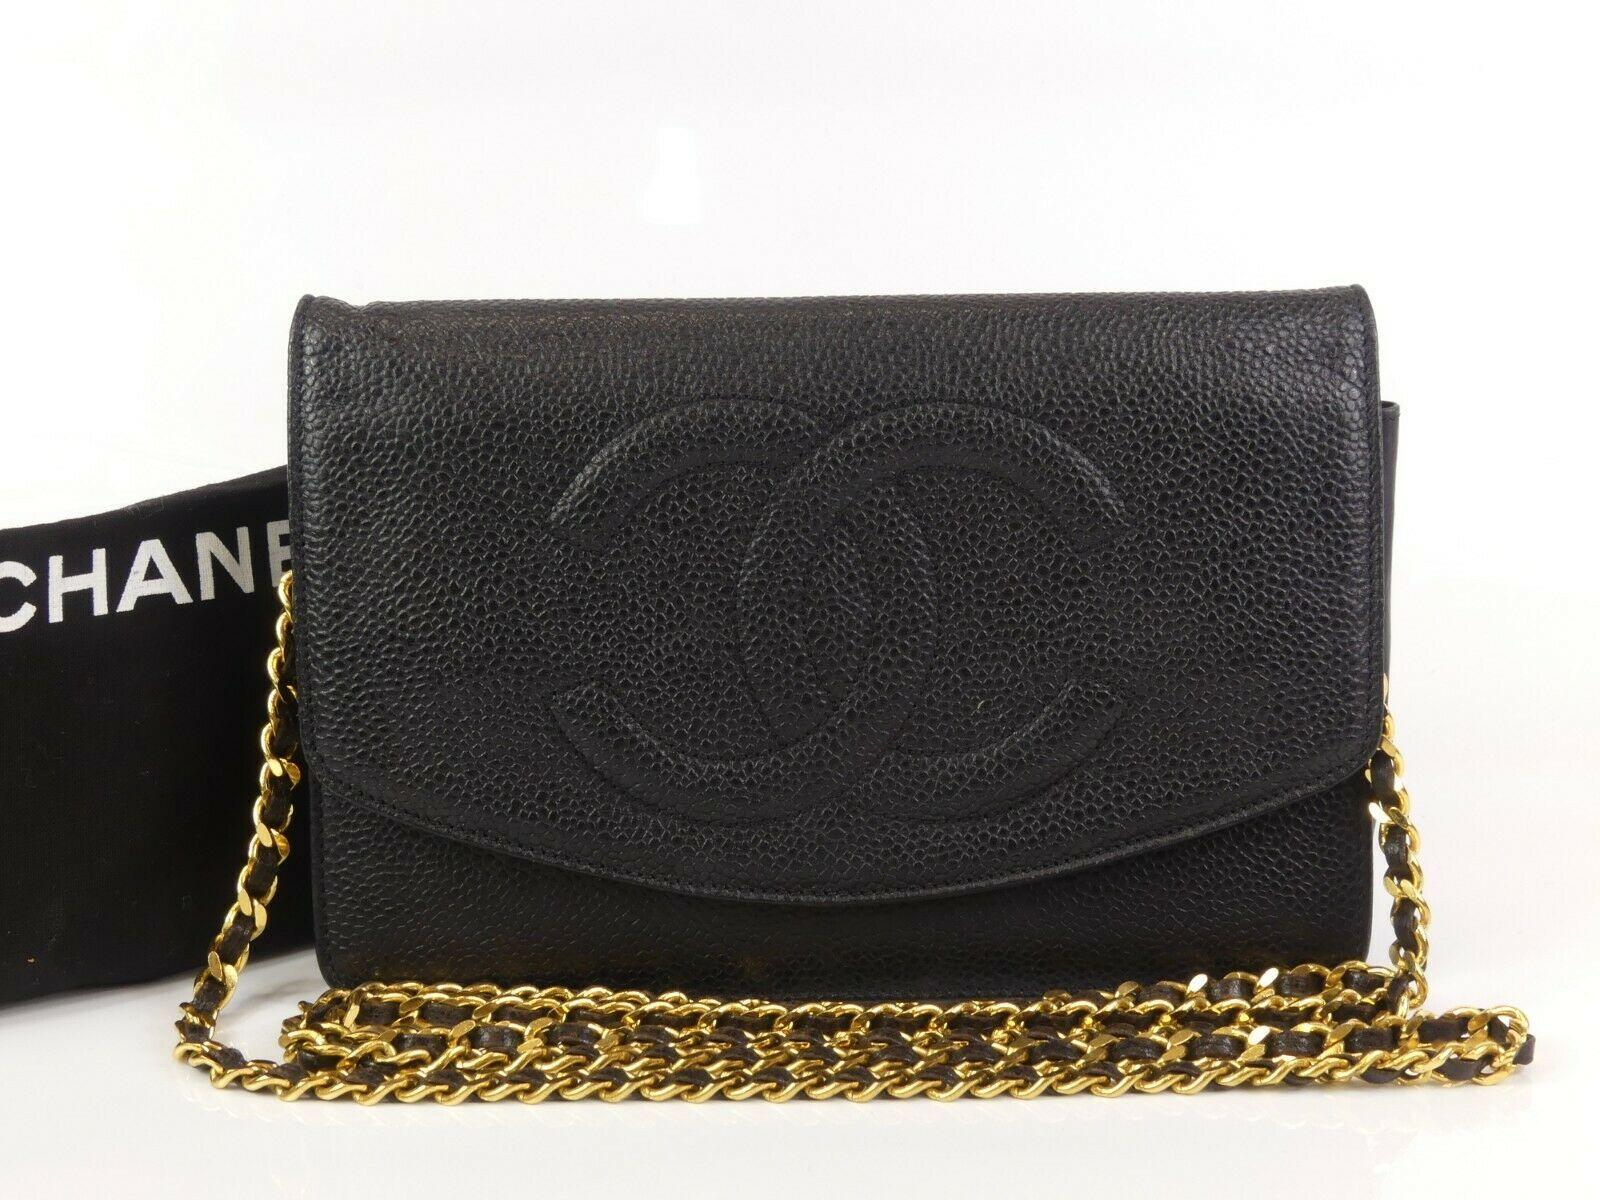 d14faac21c6f ra782 Auth CHANEL Black Caviar Skin CC Classic WOC Wallet On Chain Shoulder  Bag